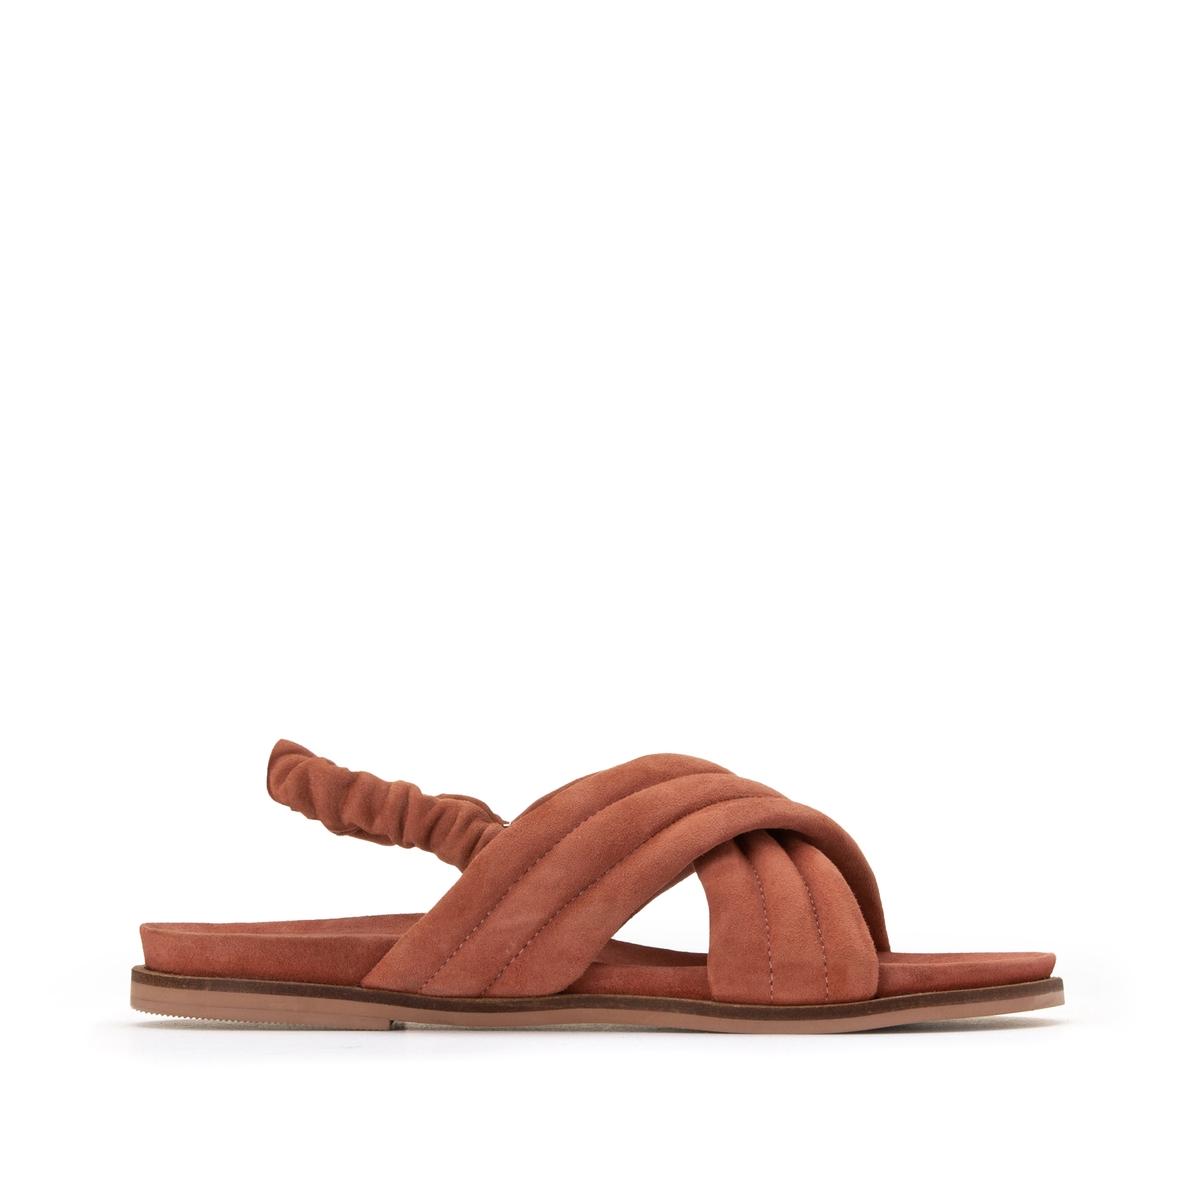 Фото - Сандалии LaRedoute Из кожи с перекрещенными ремешками на плоском каблуке 37 розовый сандалии la redoute из кожи с перекрещенными ремешками на плоском каблуке 39 розовый